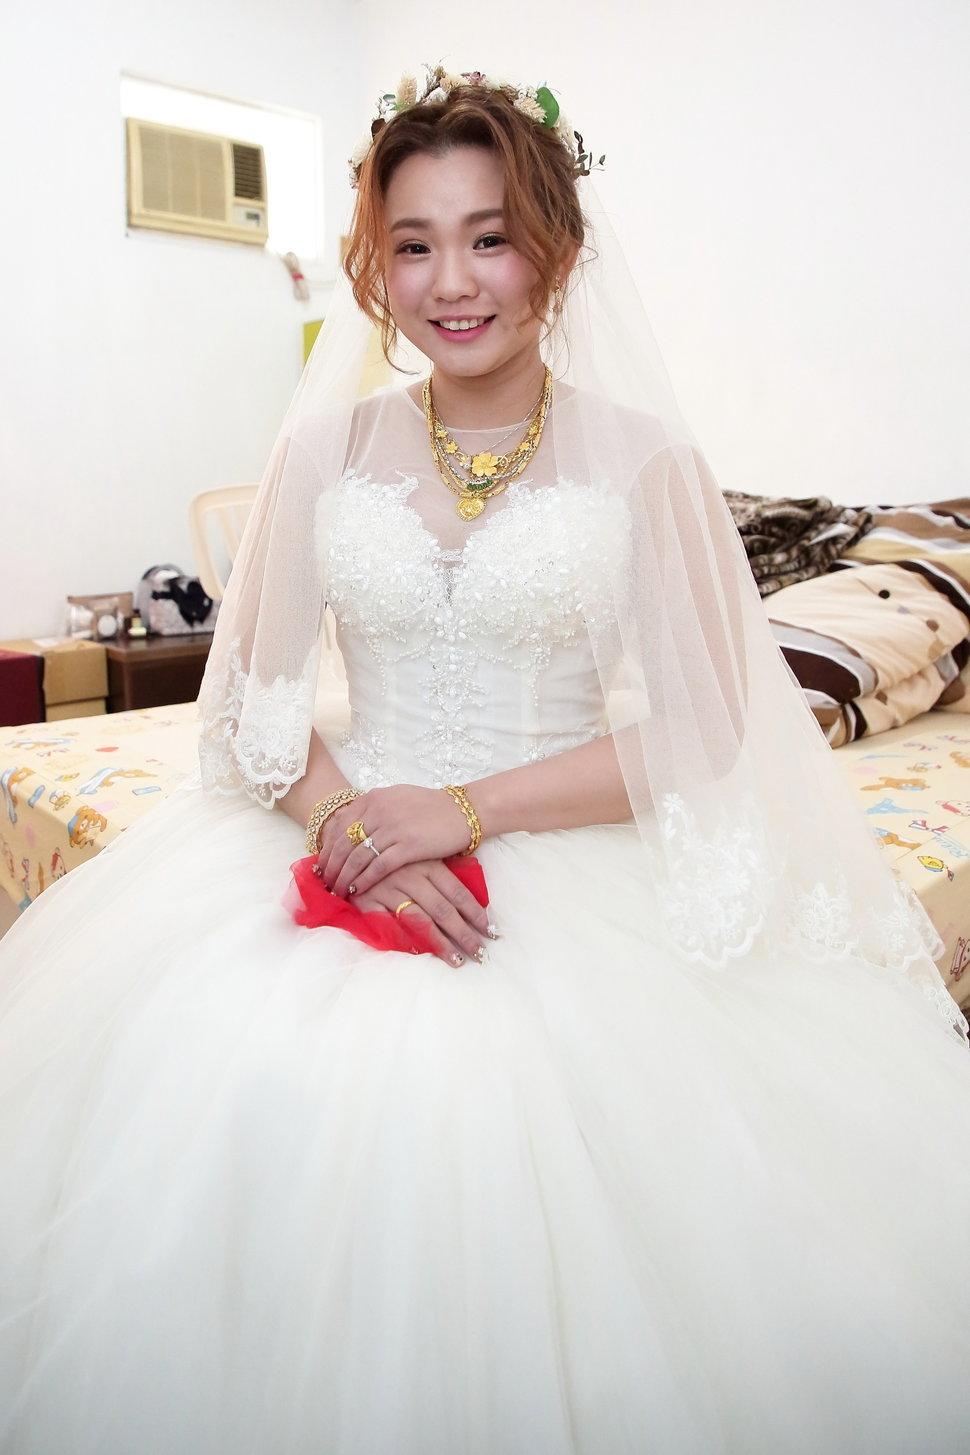 201902230088 - Loveliness ♥ wedding - 結婚吧